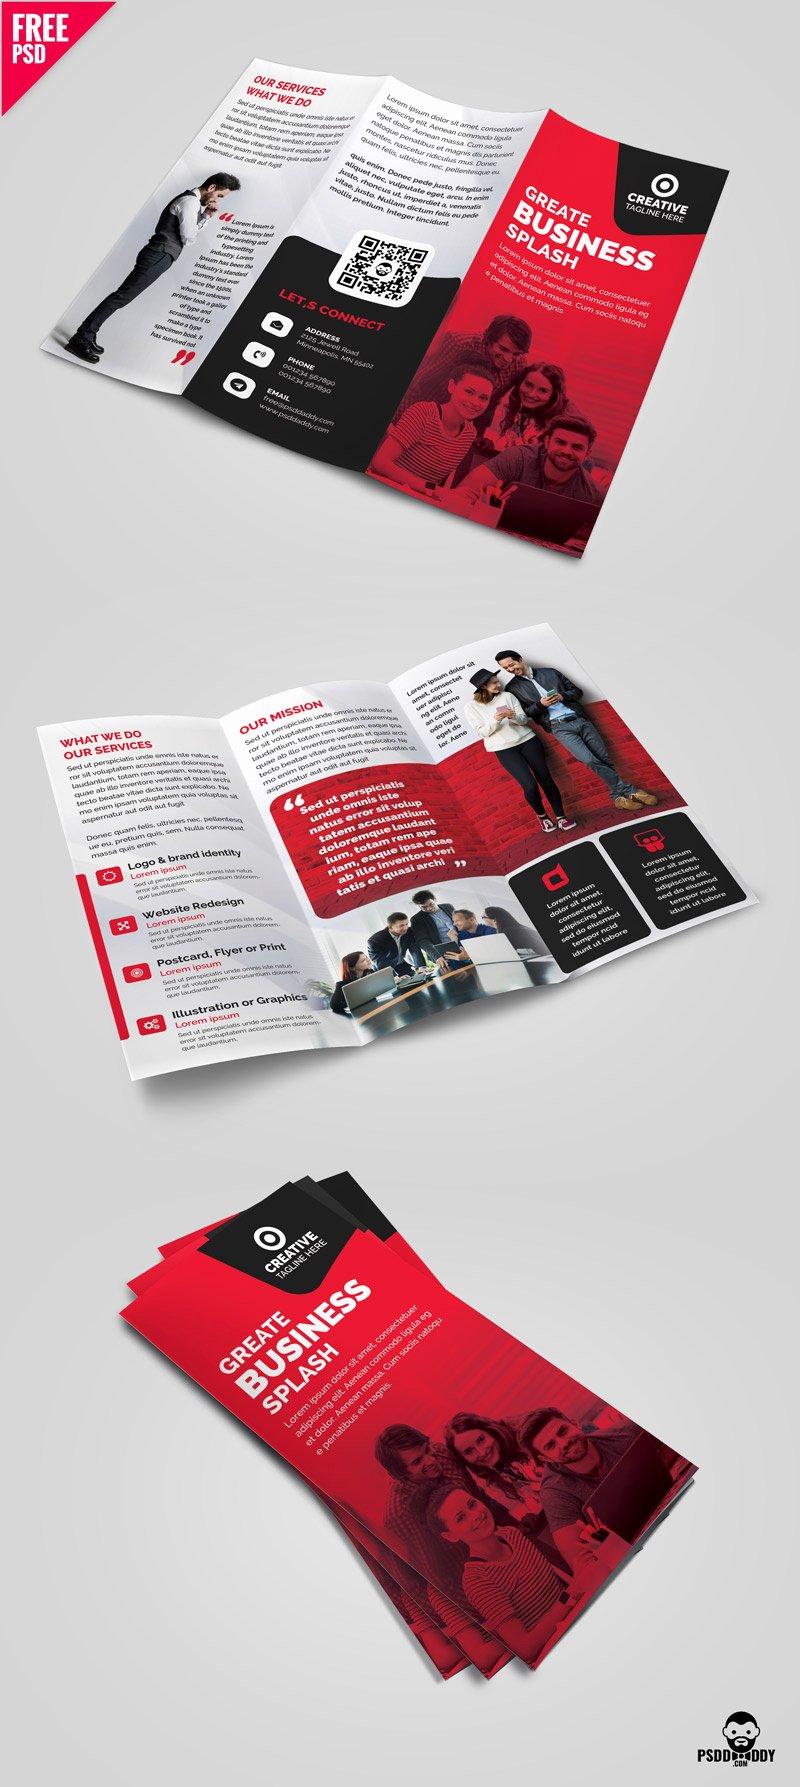 Tri Fold Brochure Template Psd Fresh Business Tri Fold Brochure Template Design Psd